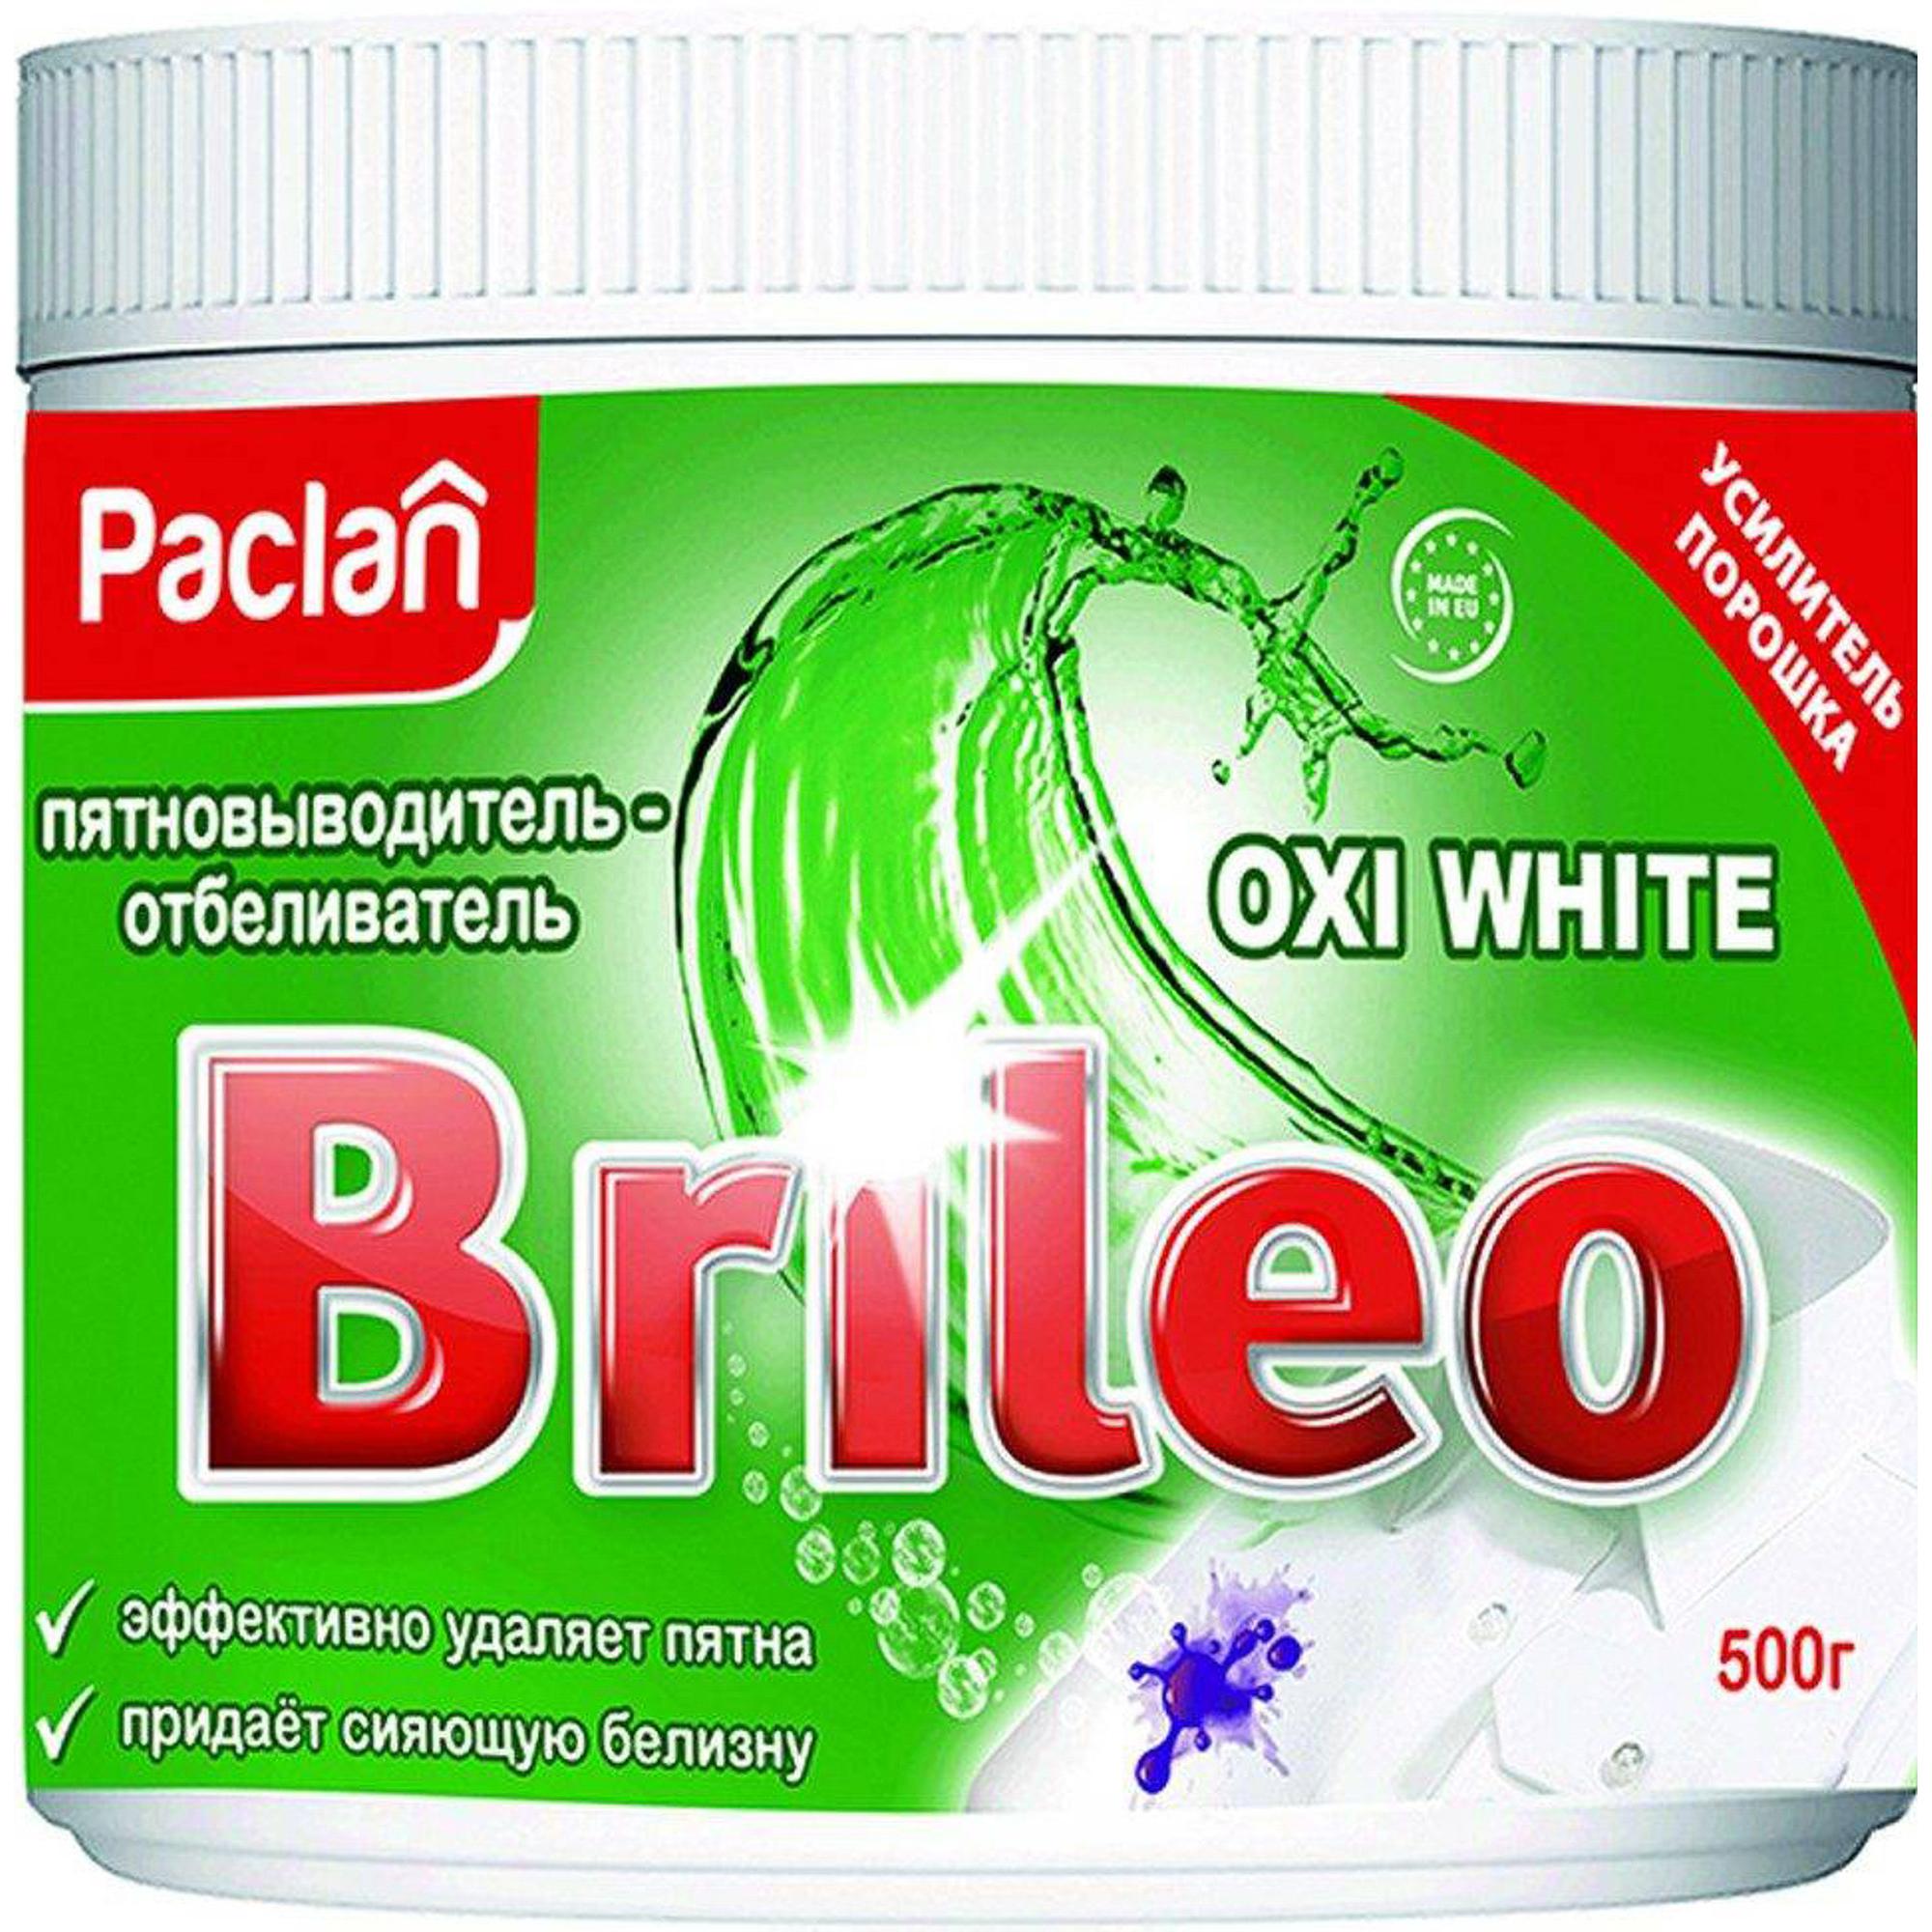 Пятновыводитель Paclan Brileo Oxi White 500 г.